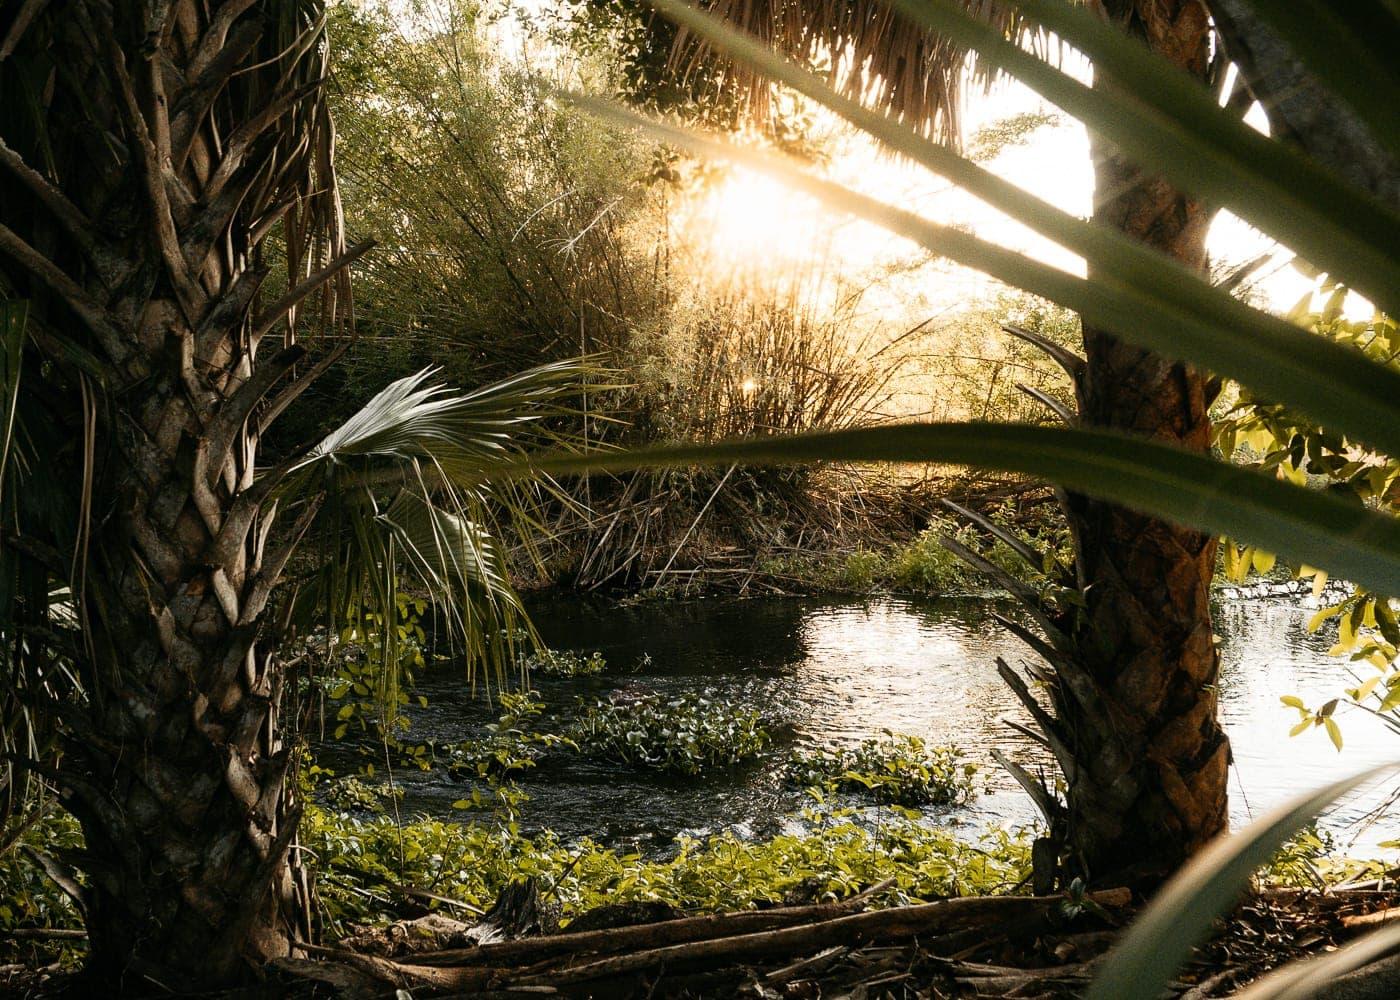 PyramidsinFlorida Jungle Park